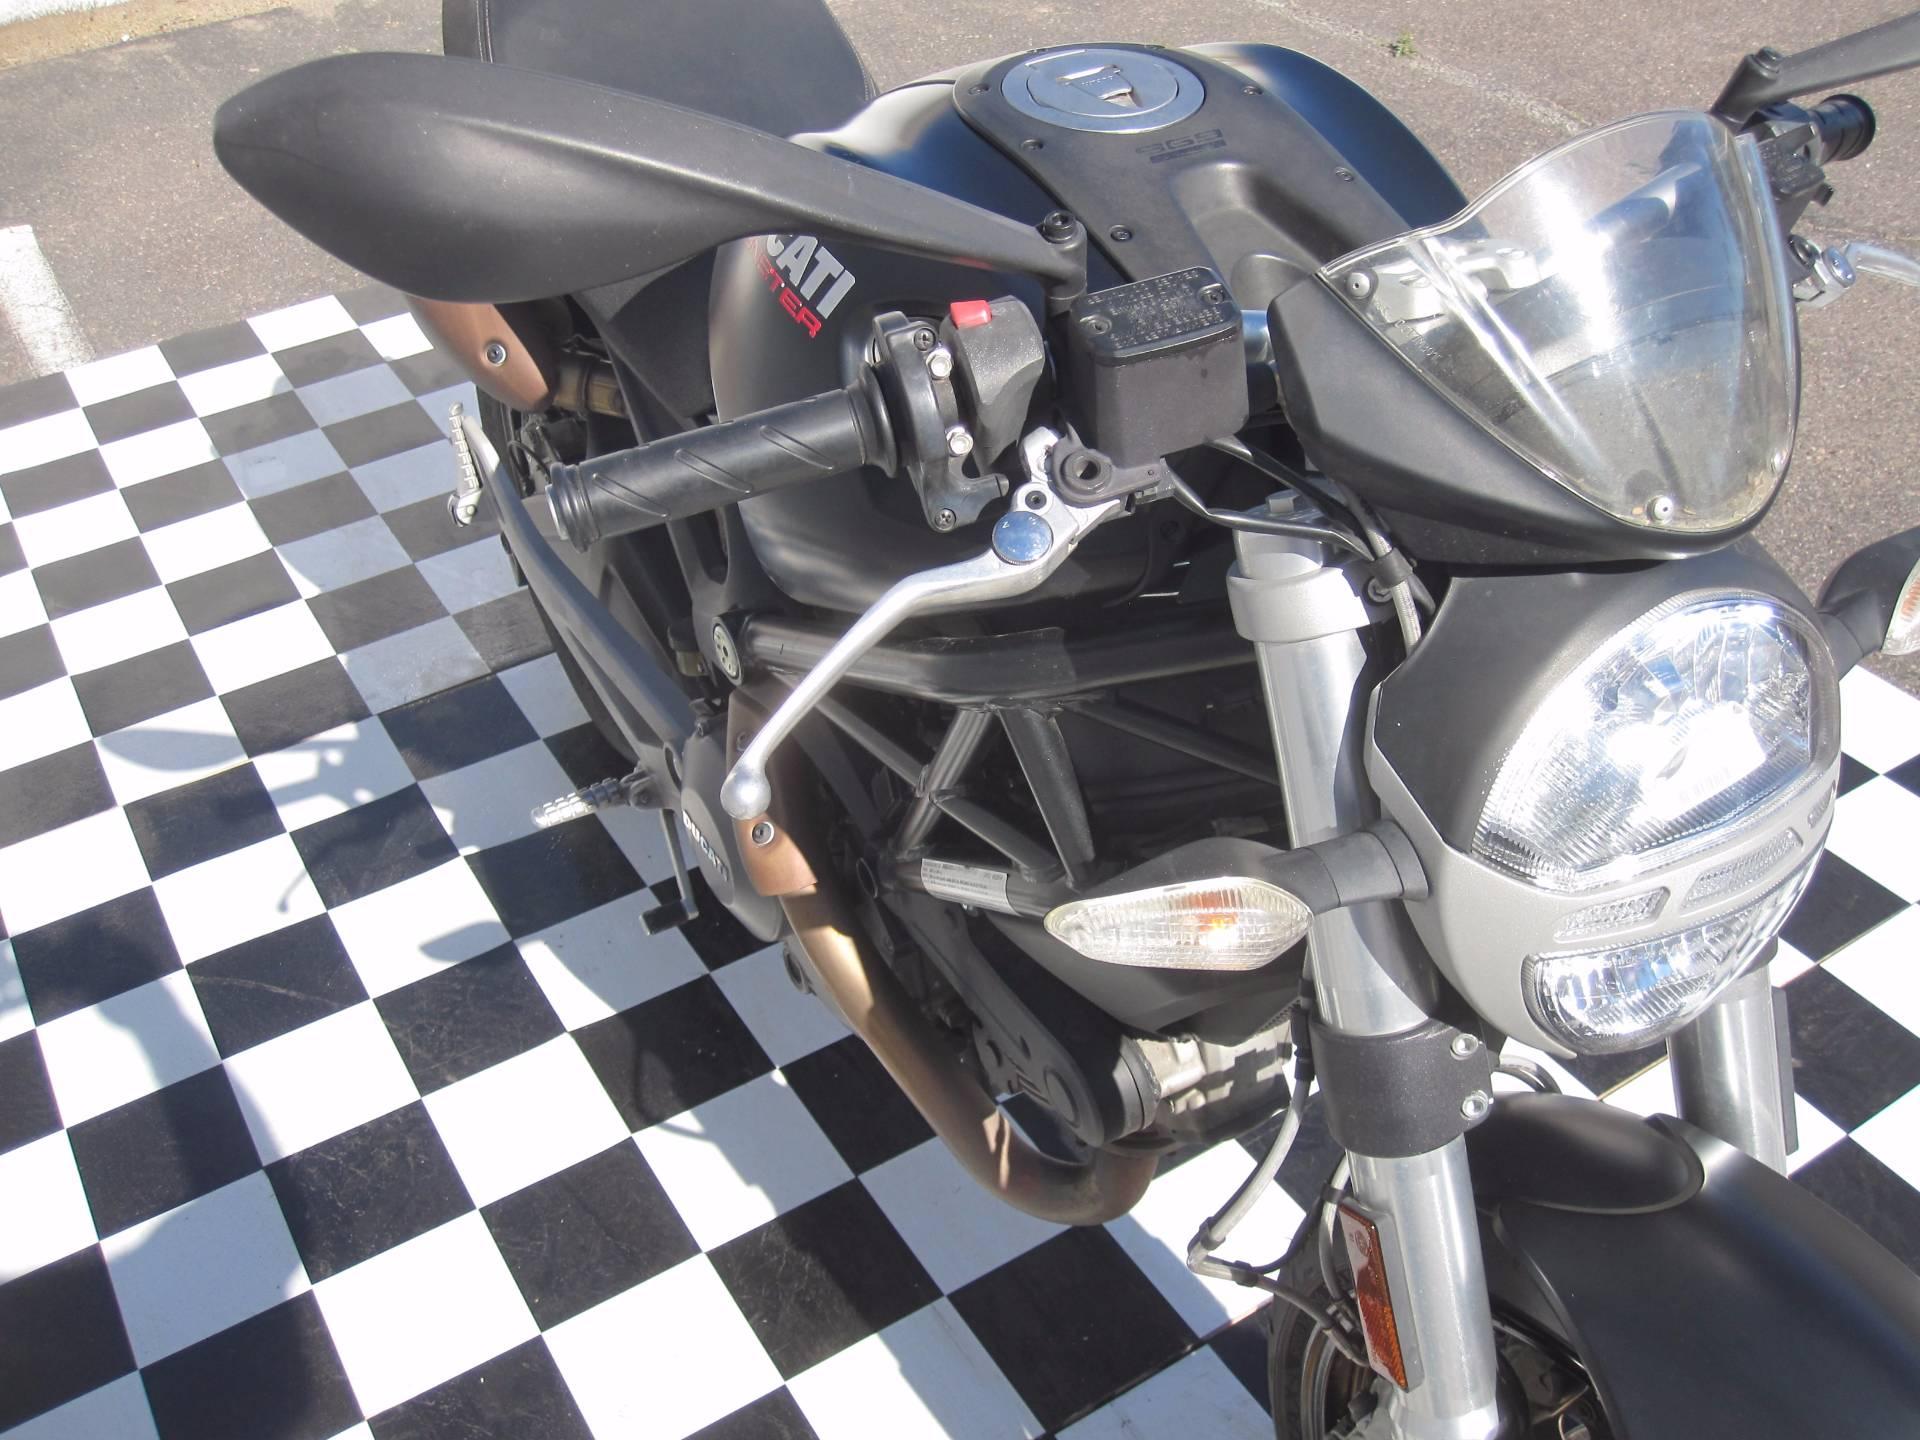 2014 Ducati Monster 696 in Phoenix, Arizona